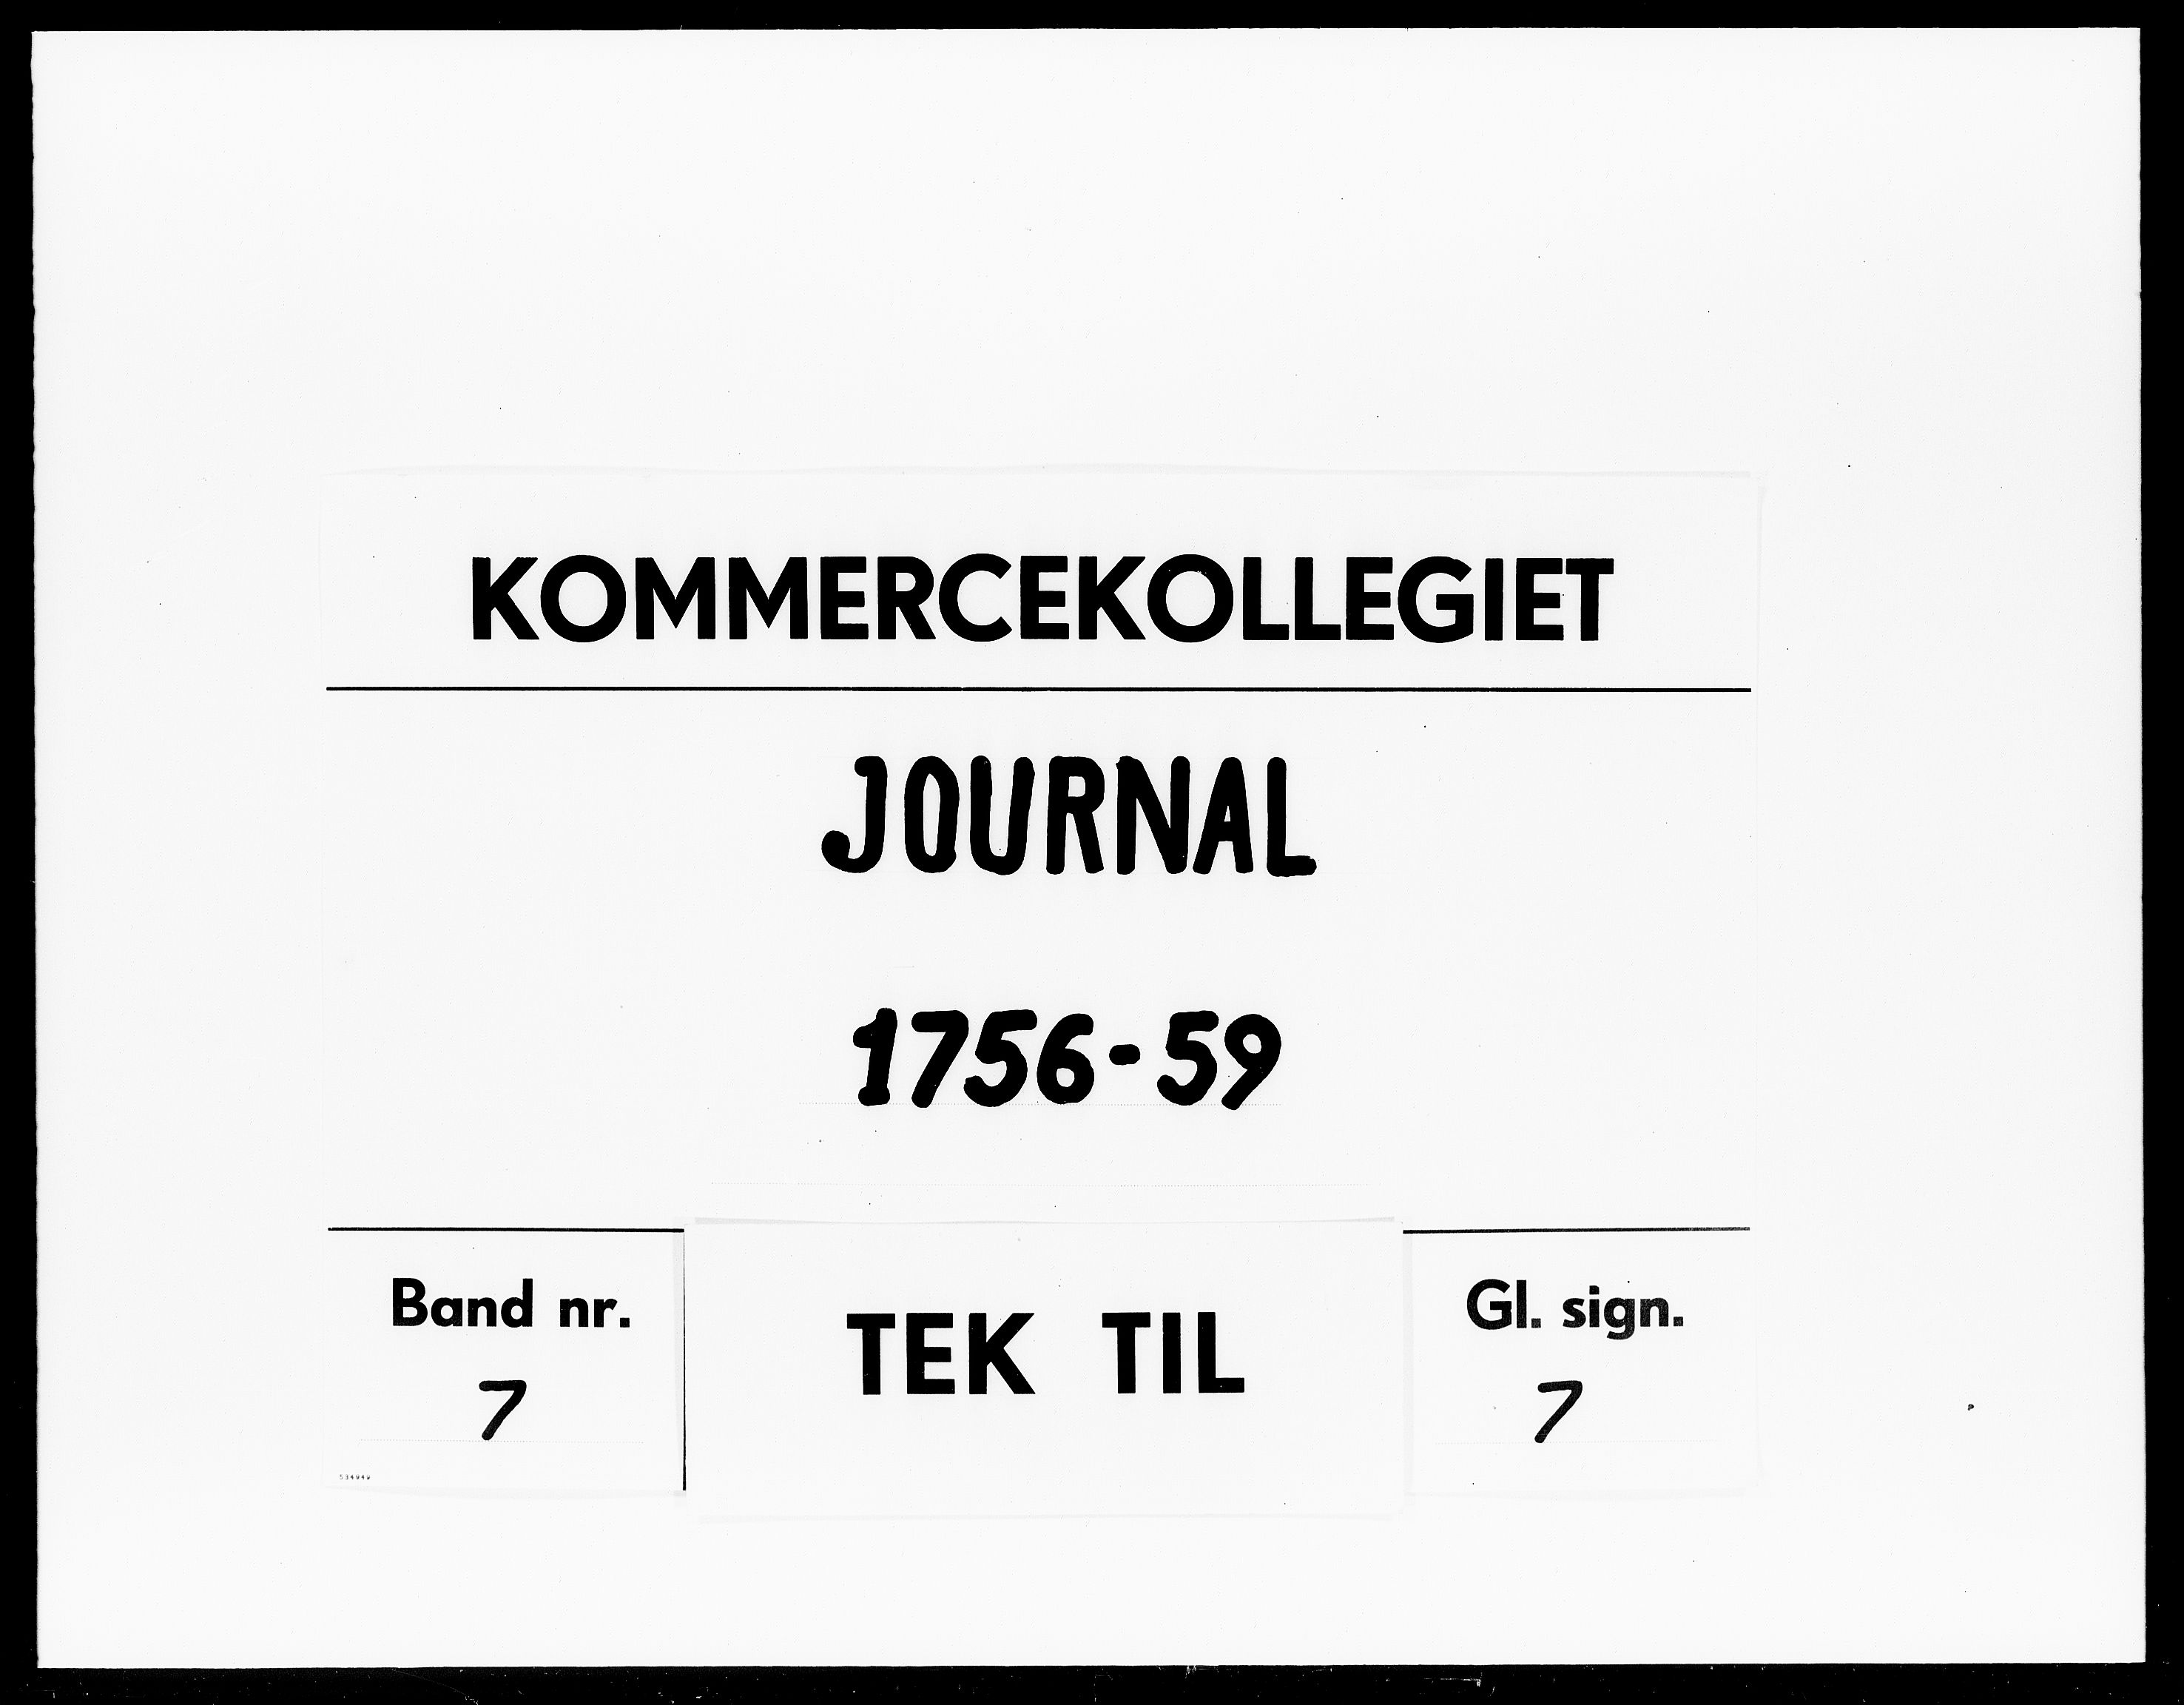 DRA, Kommercekollegiet, Dansk-Norske Sekretariat, -/55: Journal nr. 7, 1756-1759